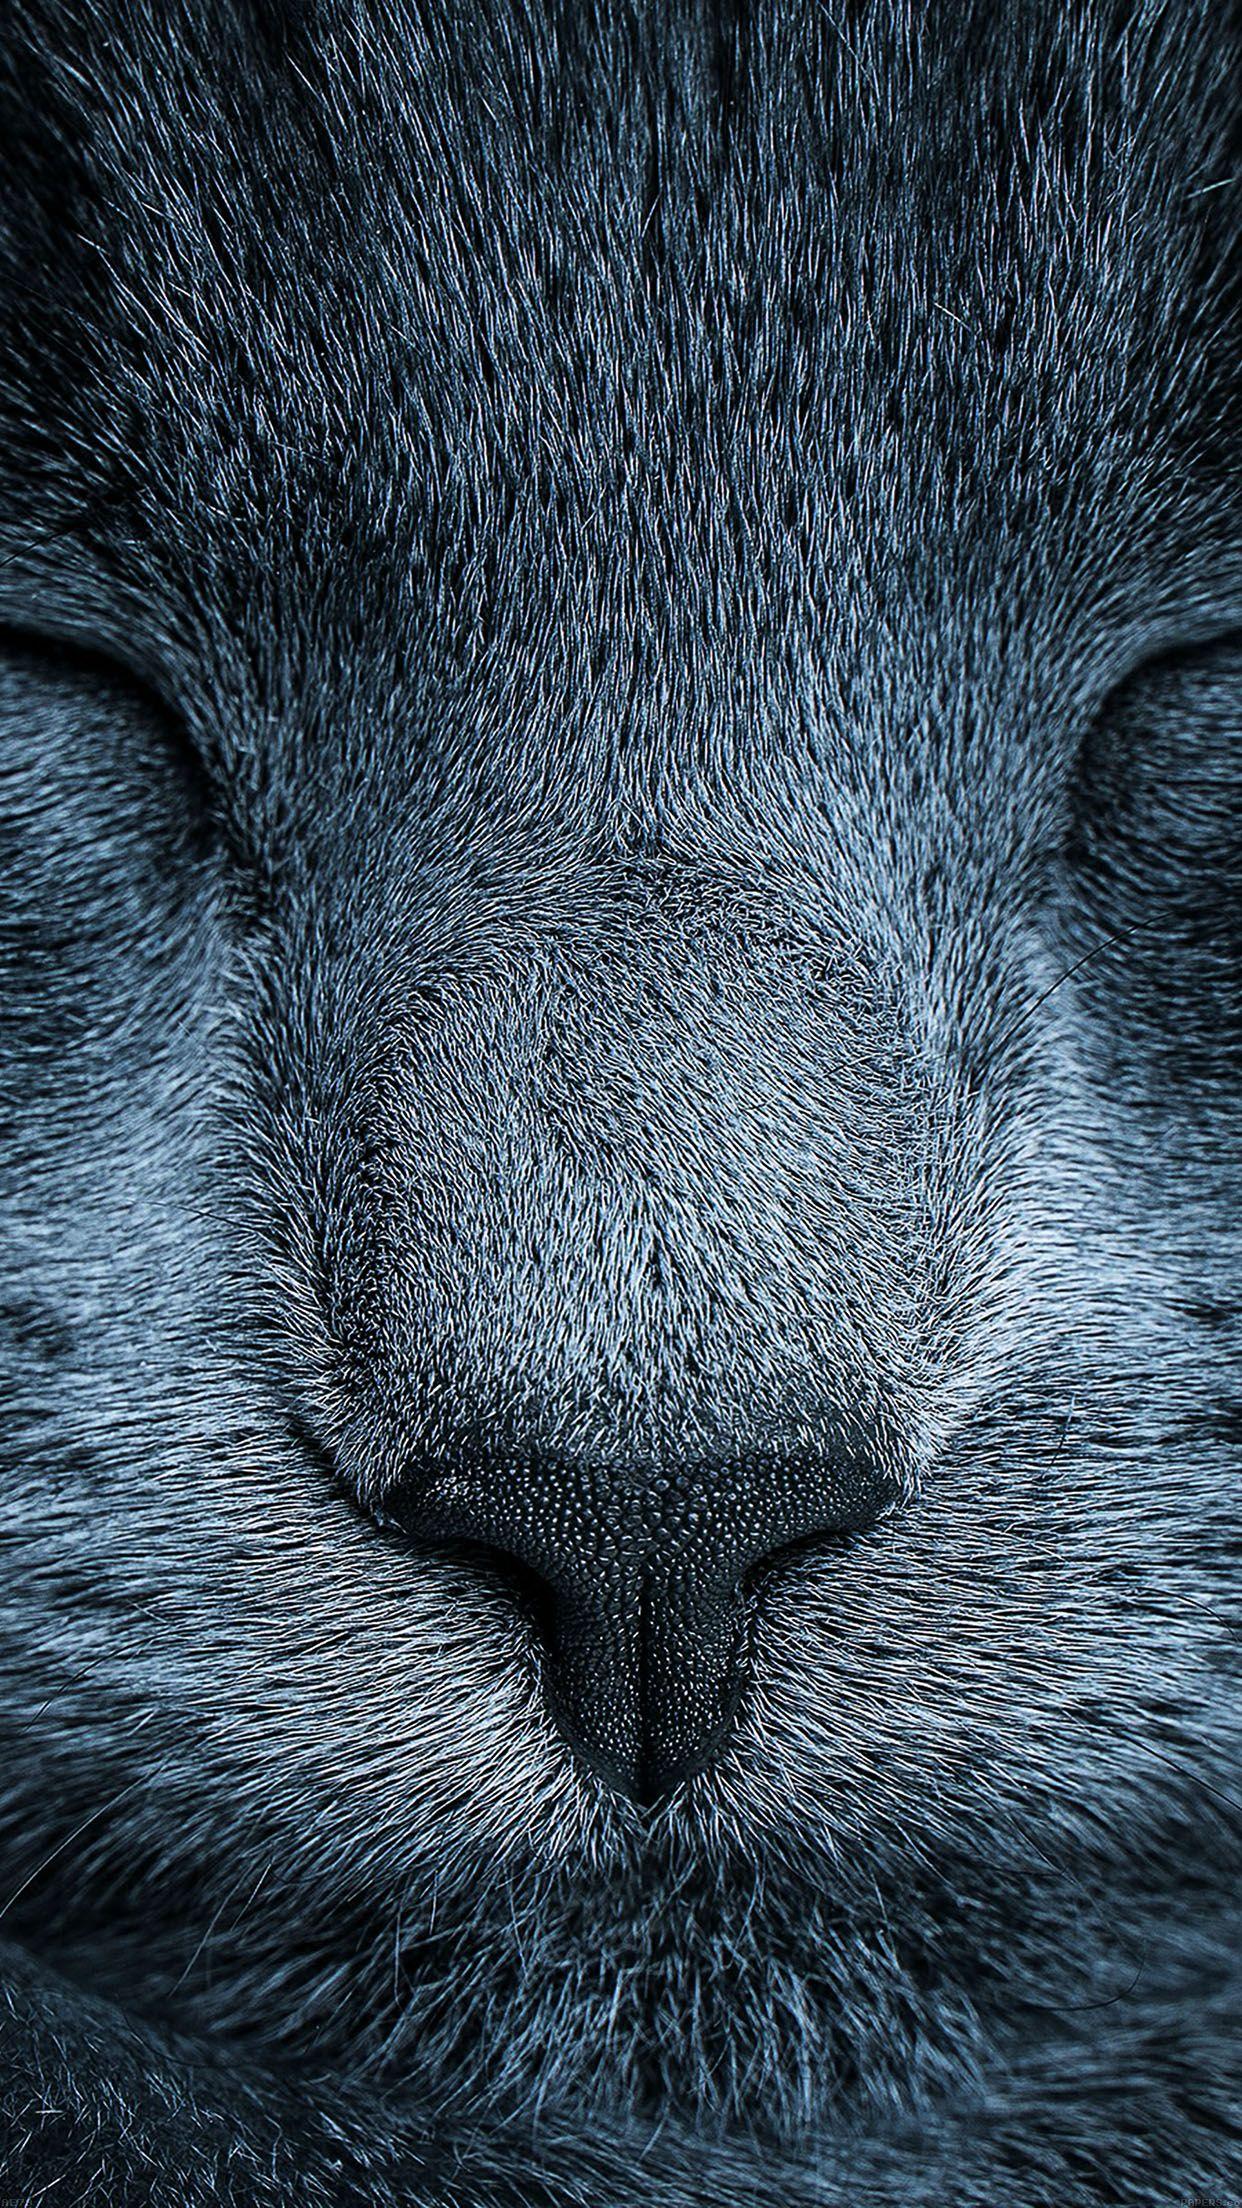 Iphone Ios 7 Wallpaper Tumblr For Ipad Animals Cats Blue Cats